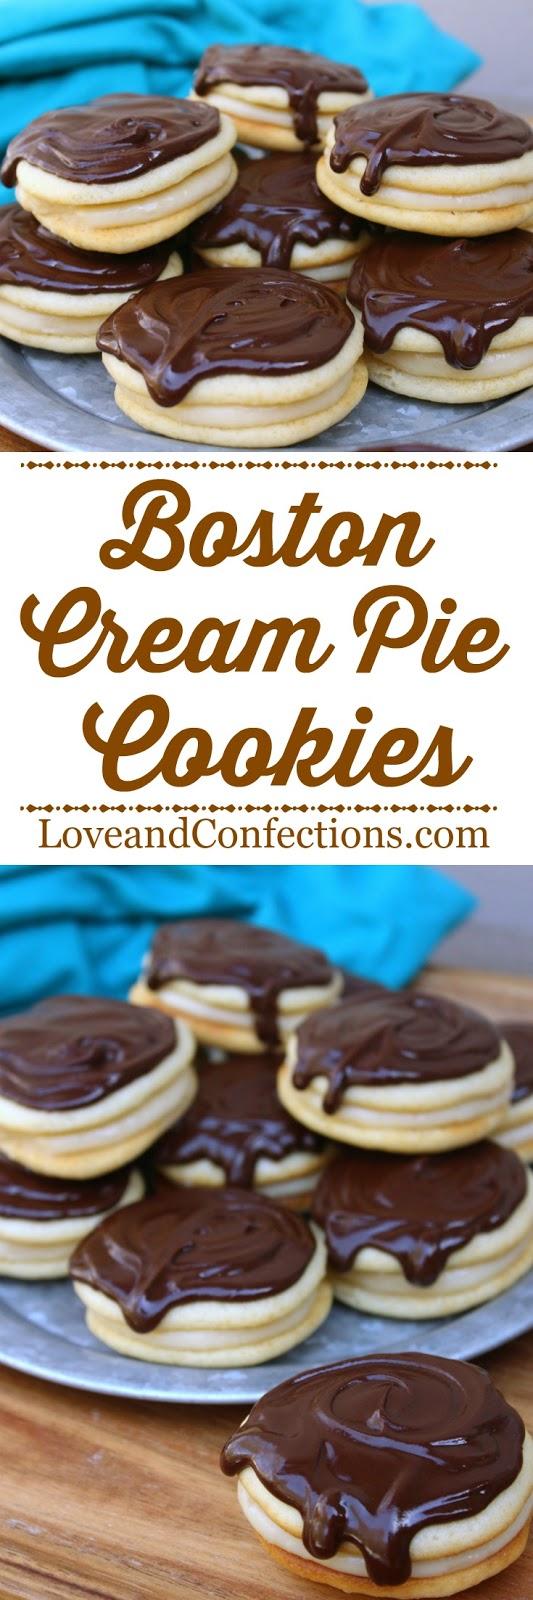 Boston Cream Pie Cookies from LoveandConfections.com